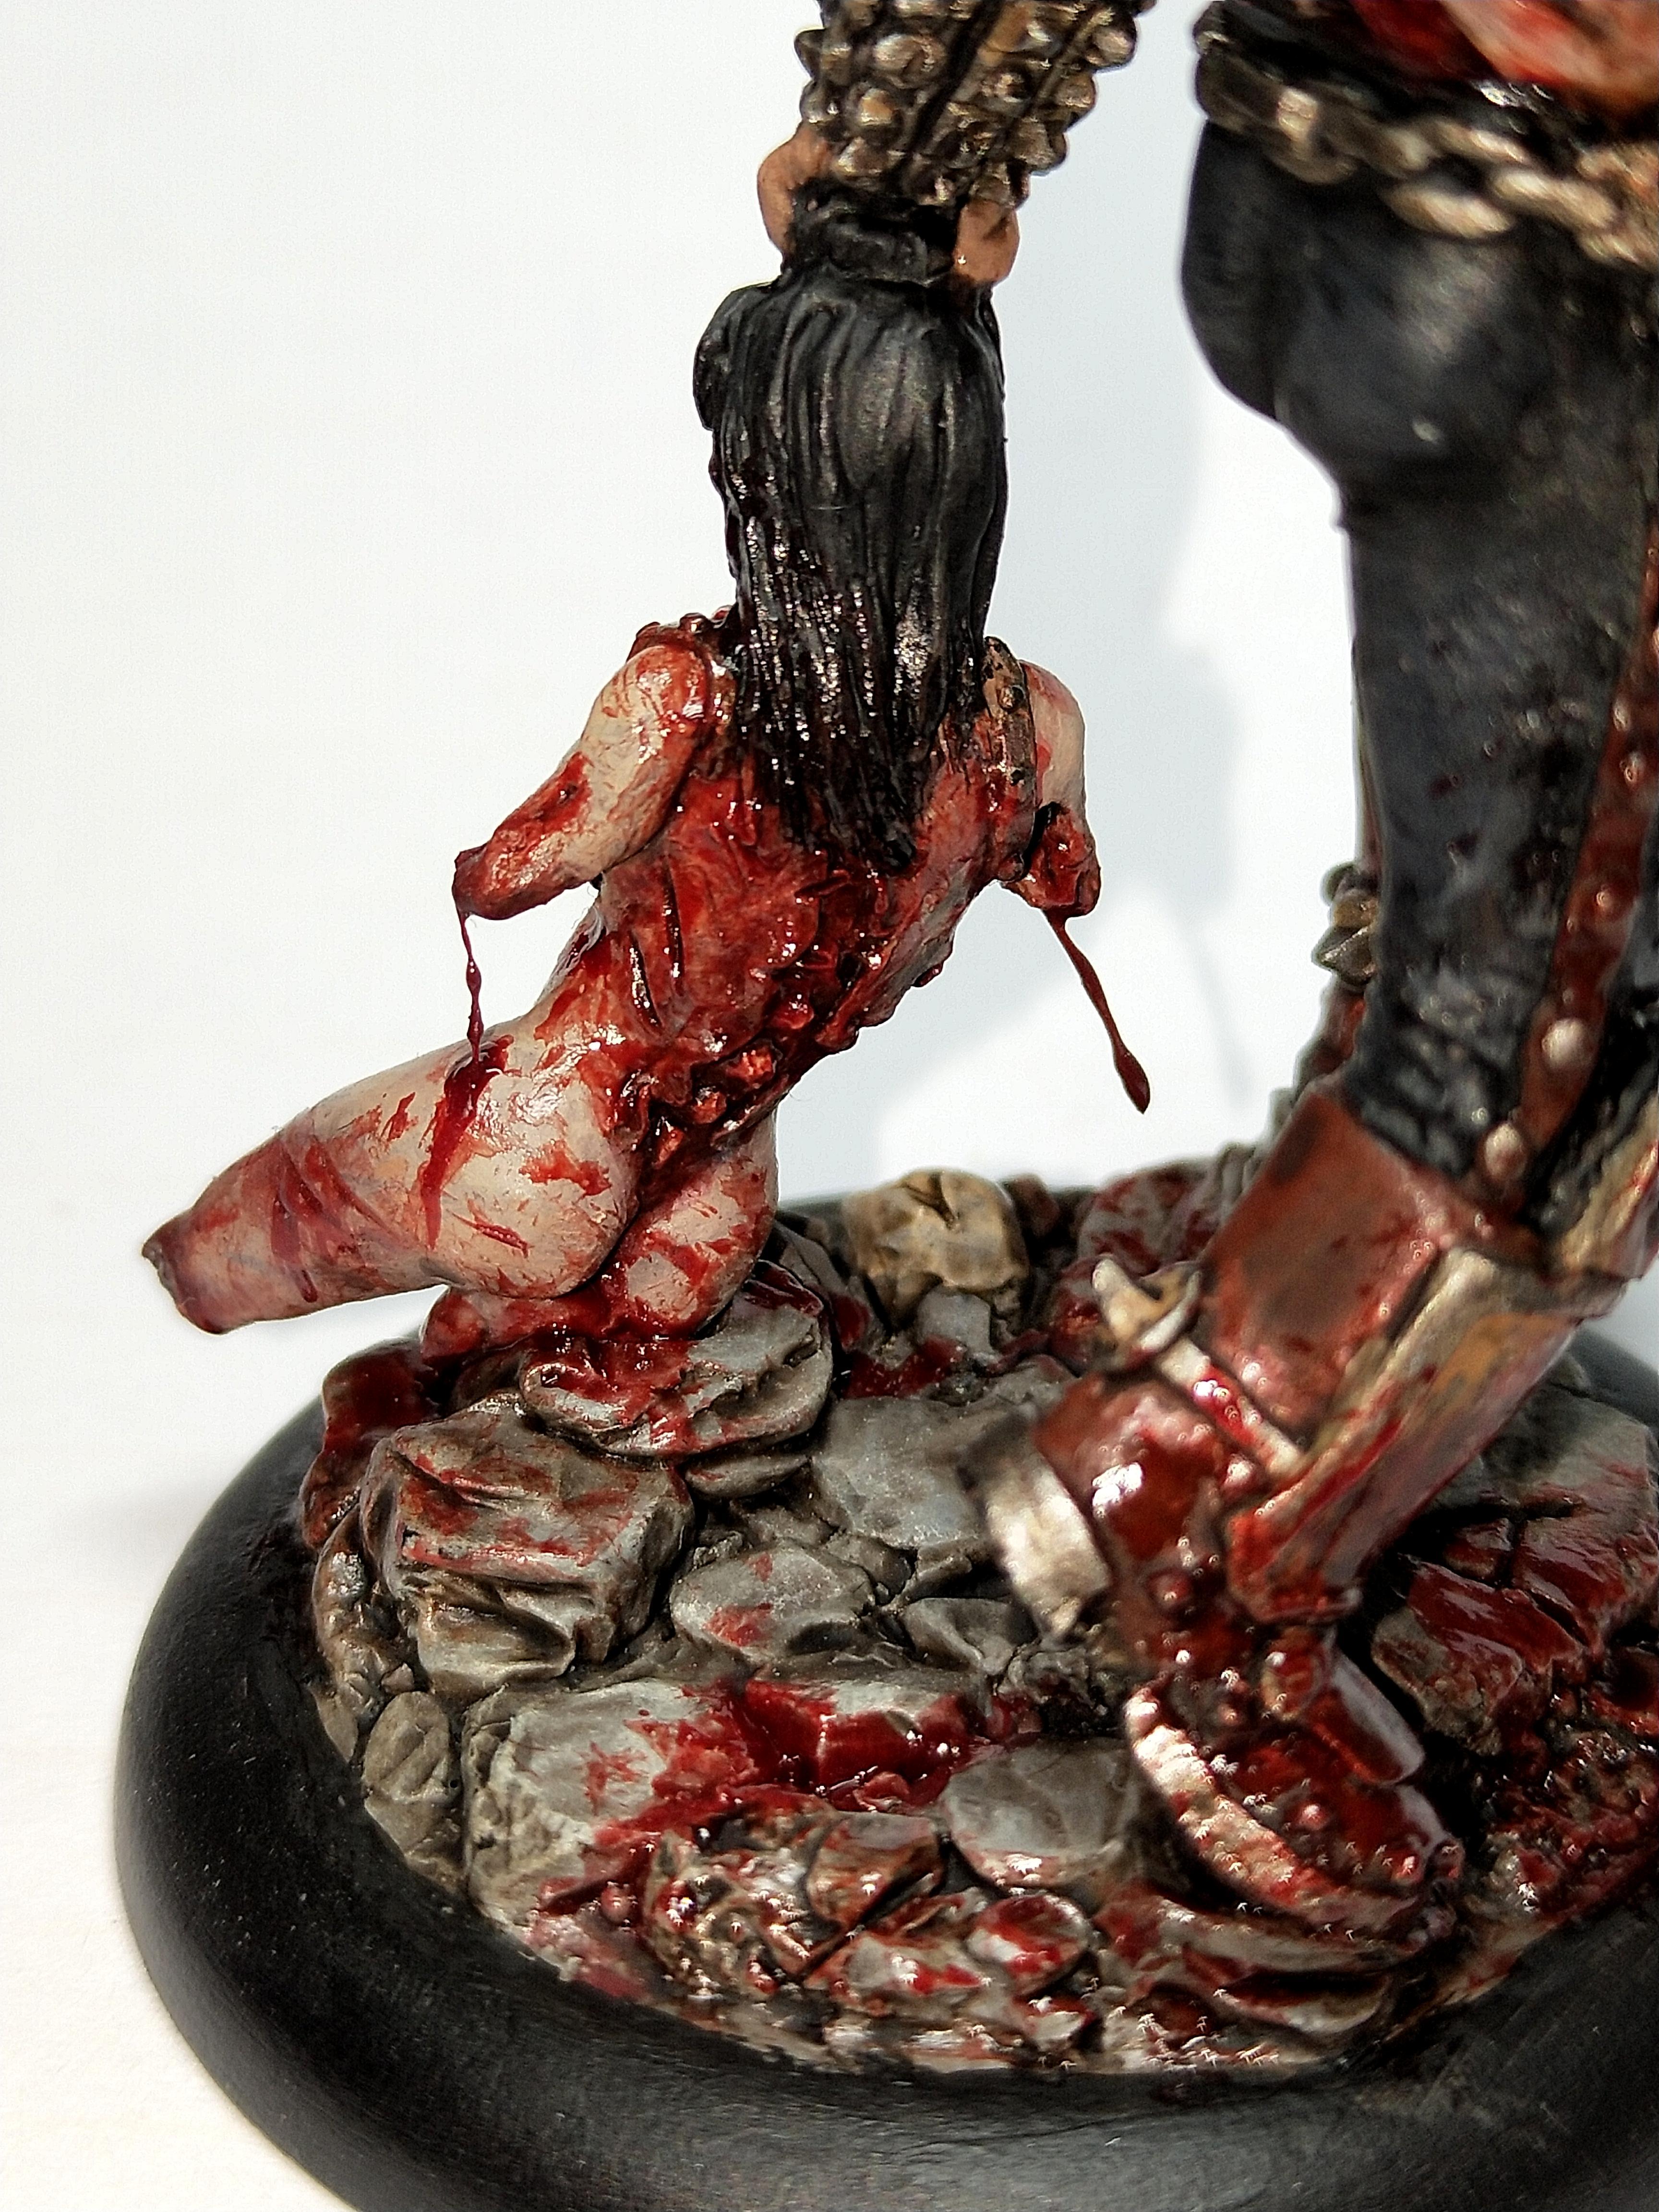 Balgeroth, Blood, Bob, Butcher, Carnage, Chainsaw, Debauchery, Gore, Nsfw